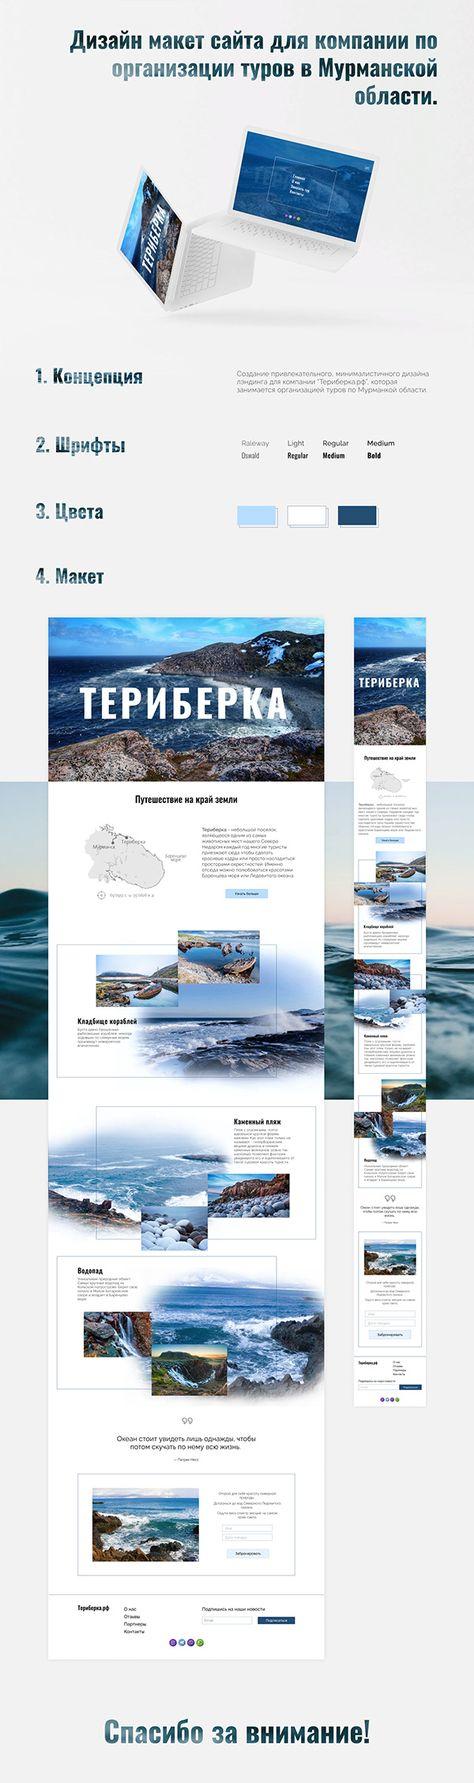 Landing page для сайта турагенства Териберка.рф